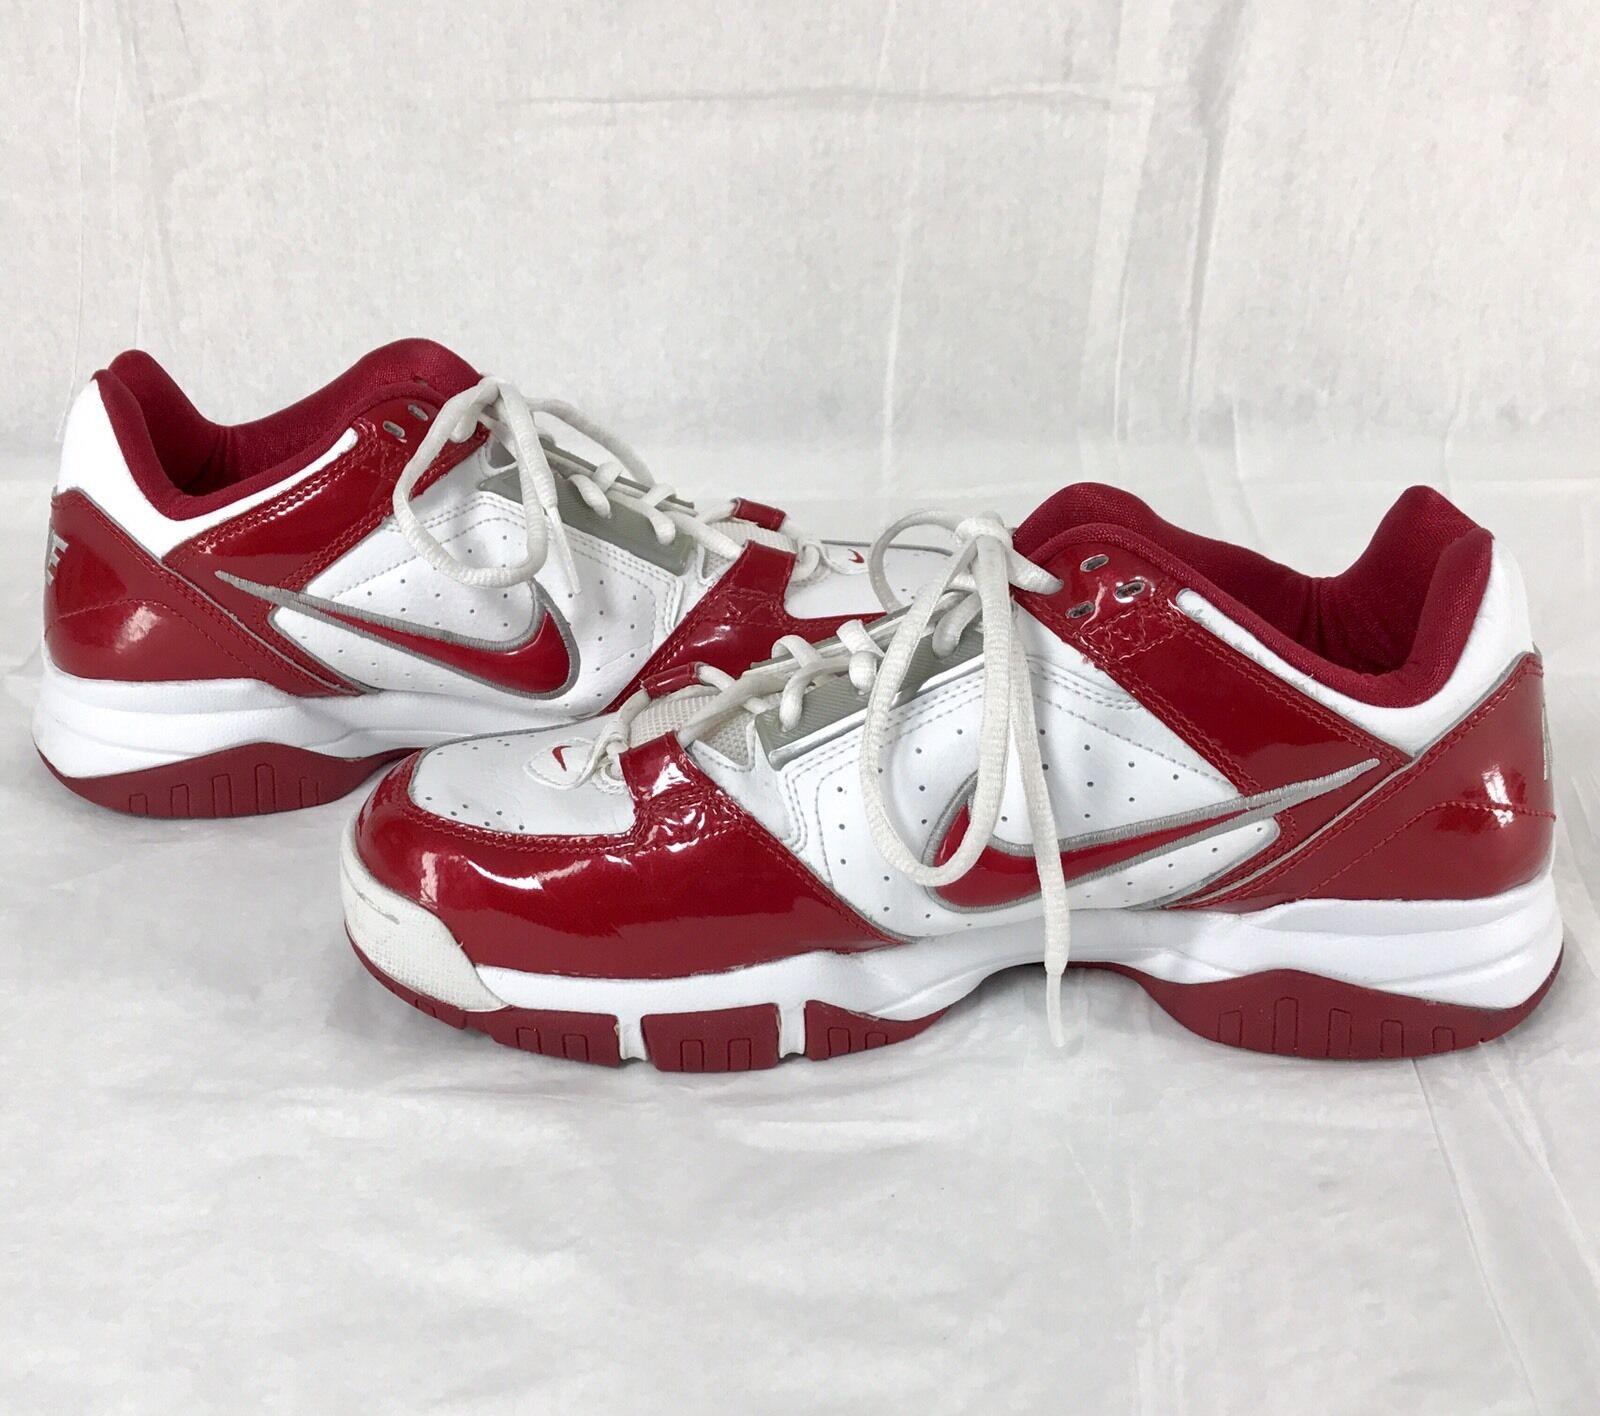 Nike temporada Air Rojo Blanco baja temporada Nike 2018 zapatos Hombre cómodo despacho venta 43e8eb